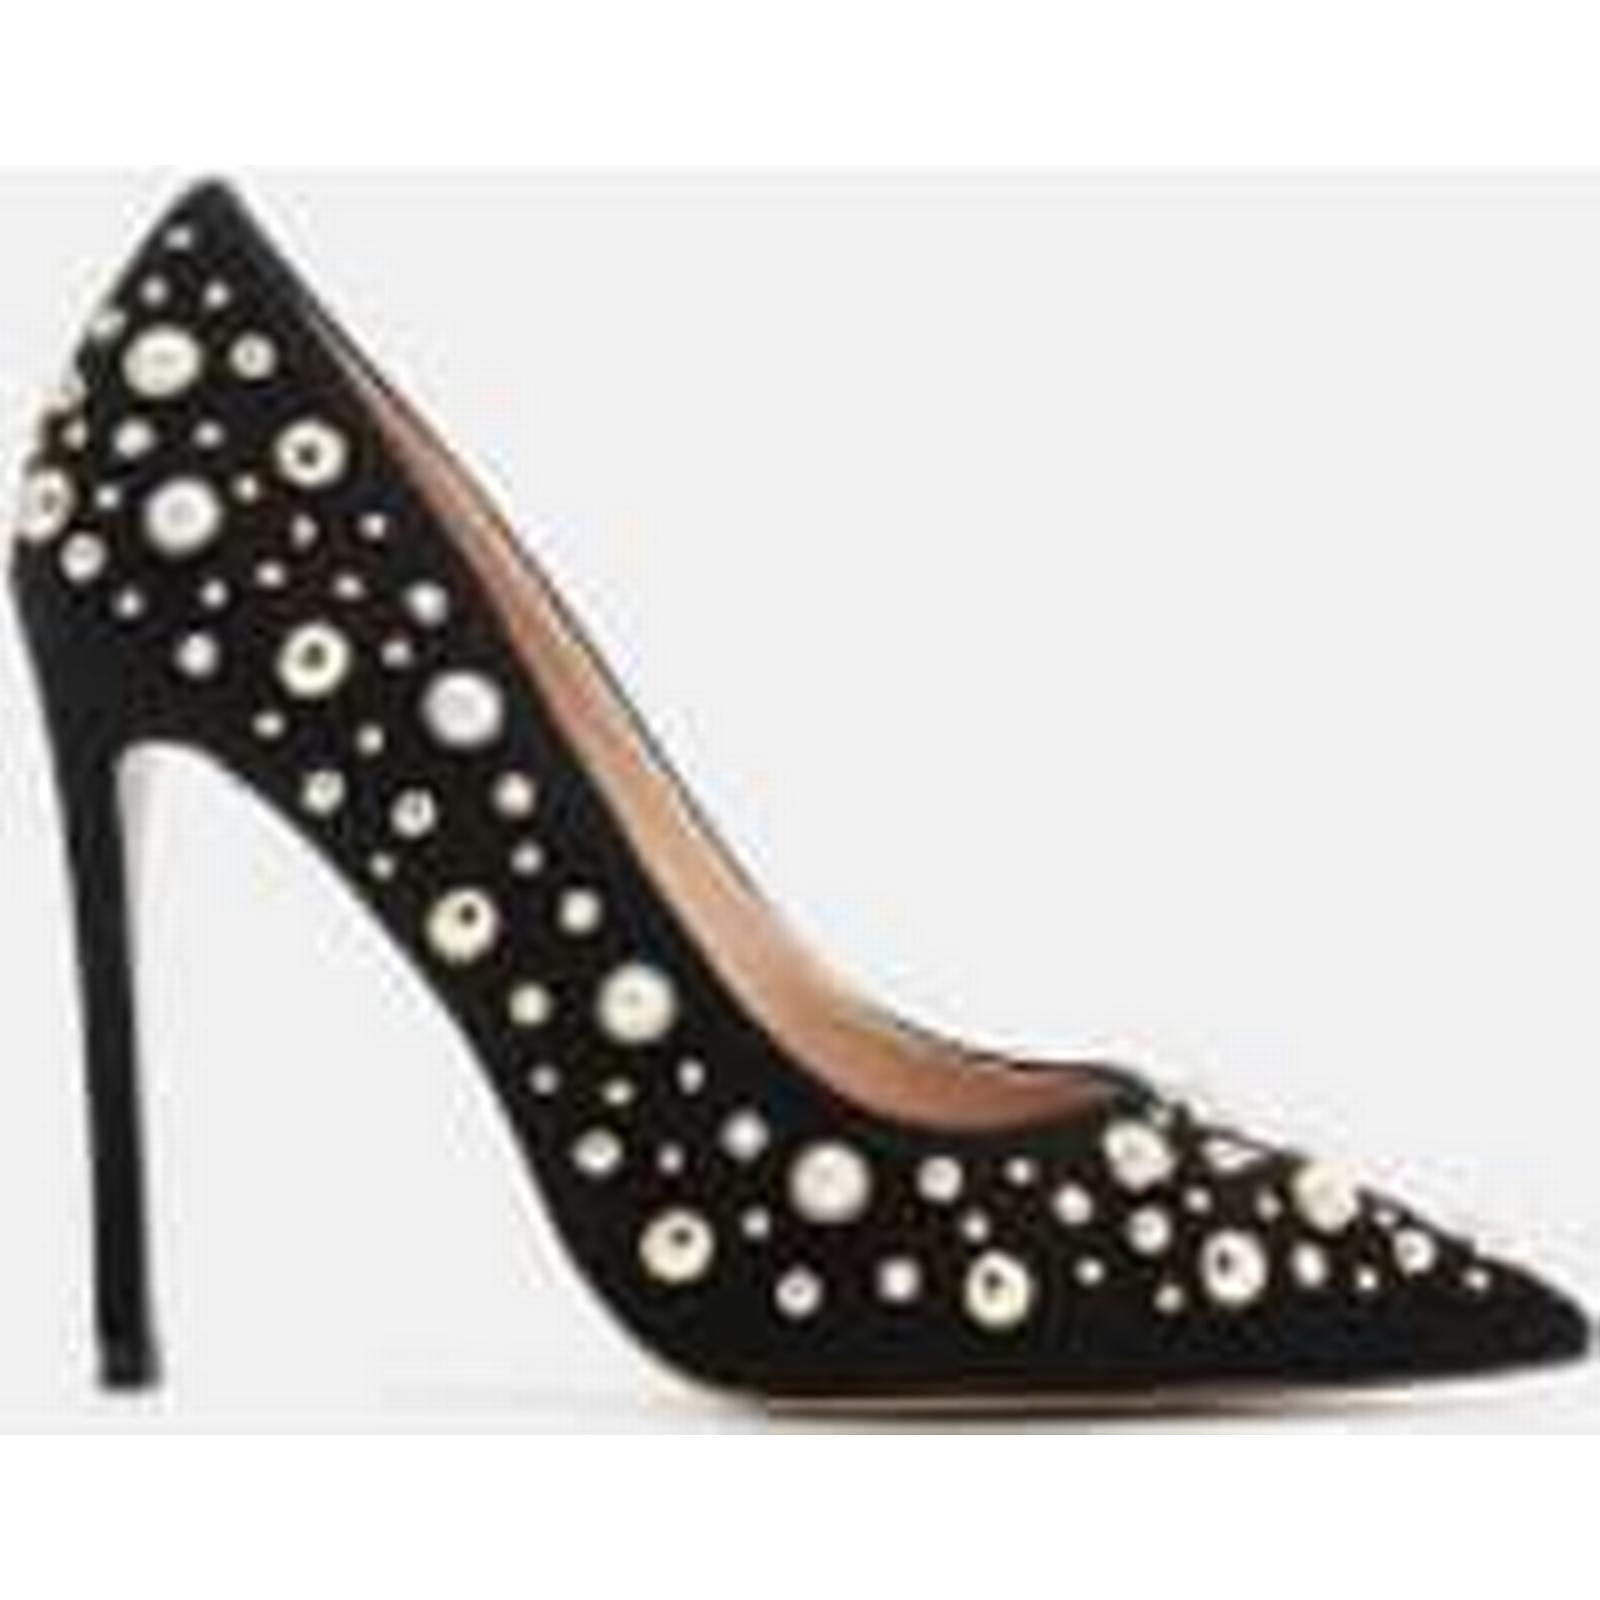 Carvela Women's Court Alabaster Suede Embellished Court Women's Shoes - Black a07d04